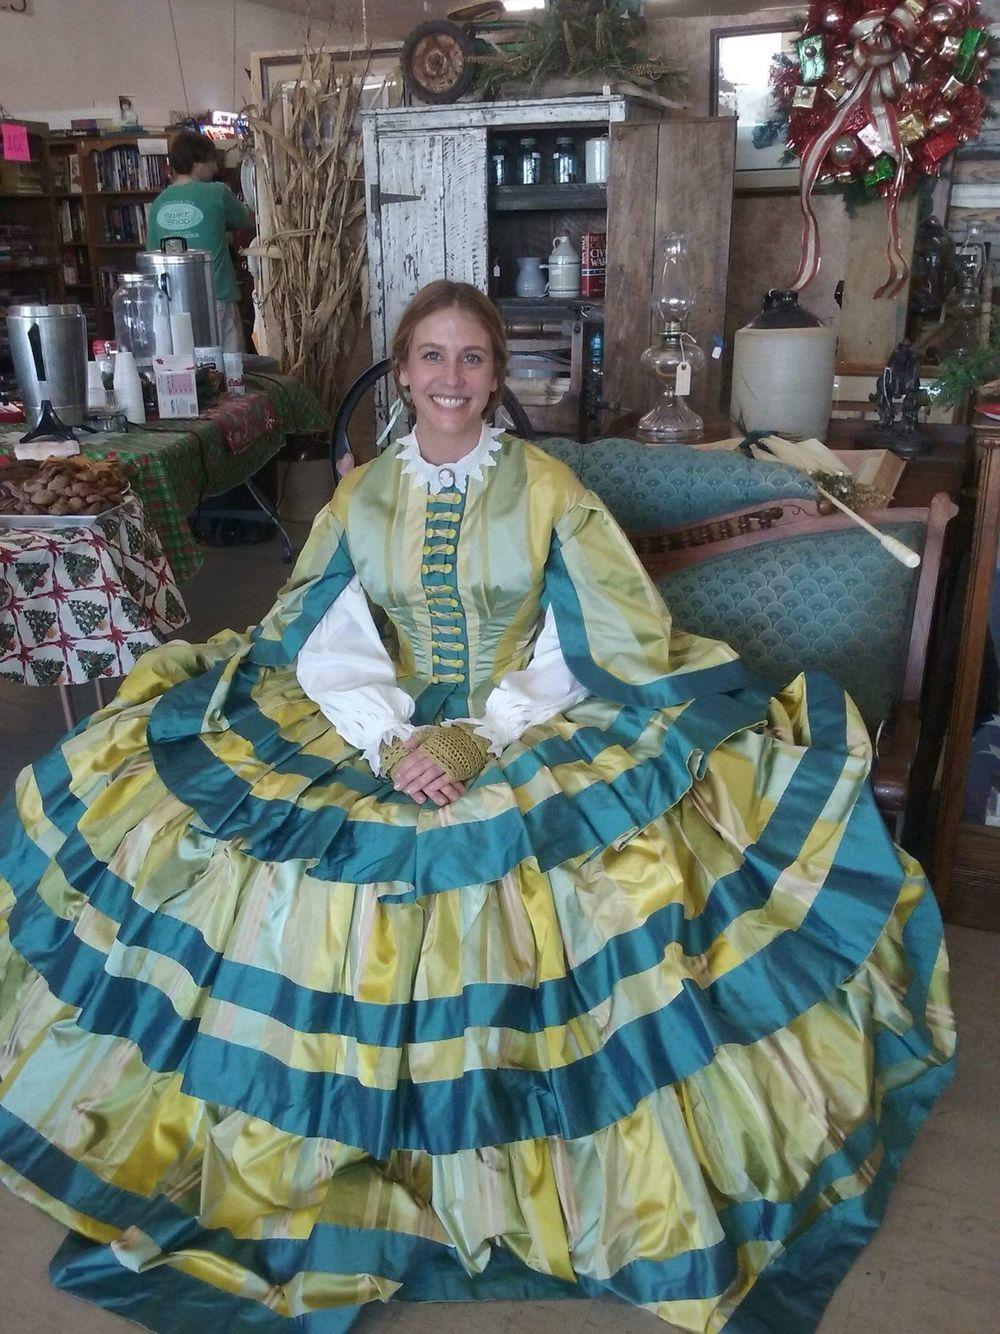 silk taffeta, at the antique mall in wetumpka al. dress is